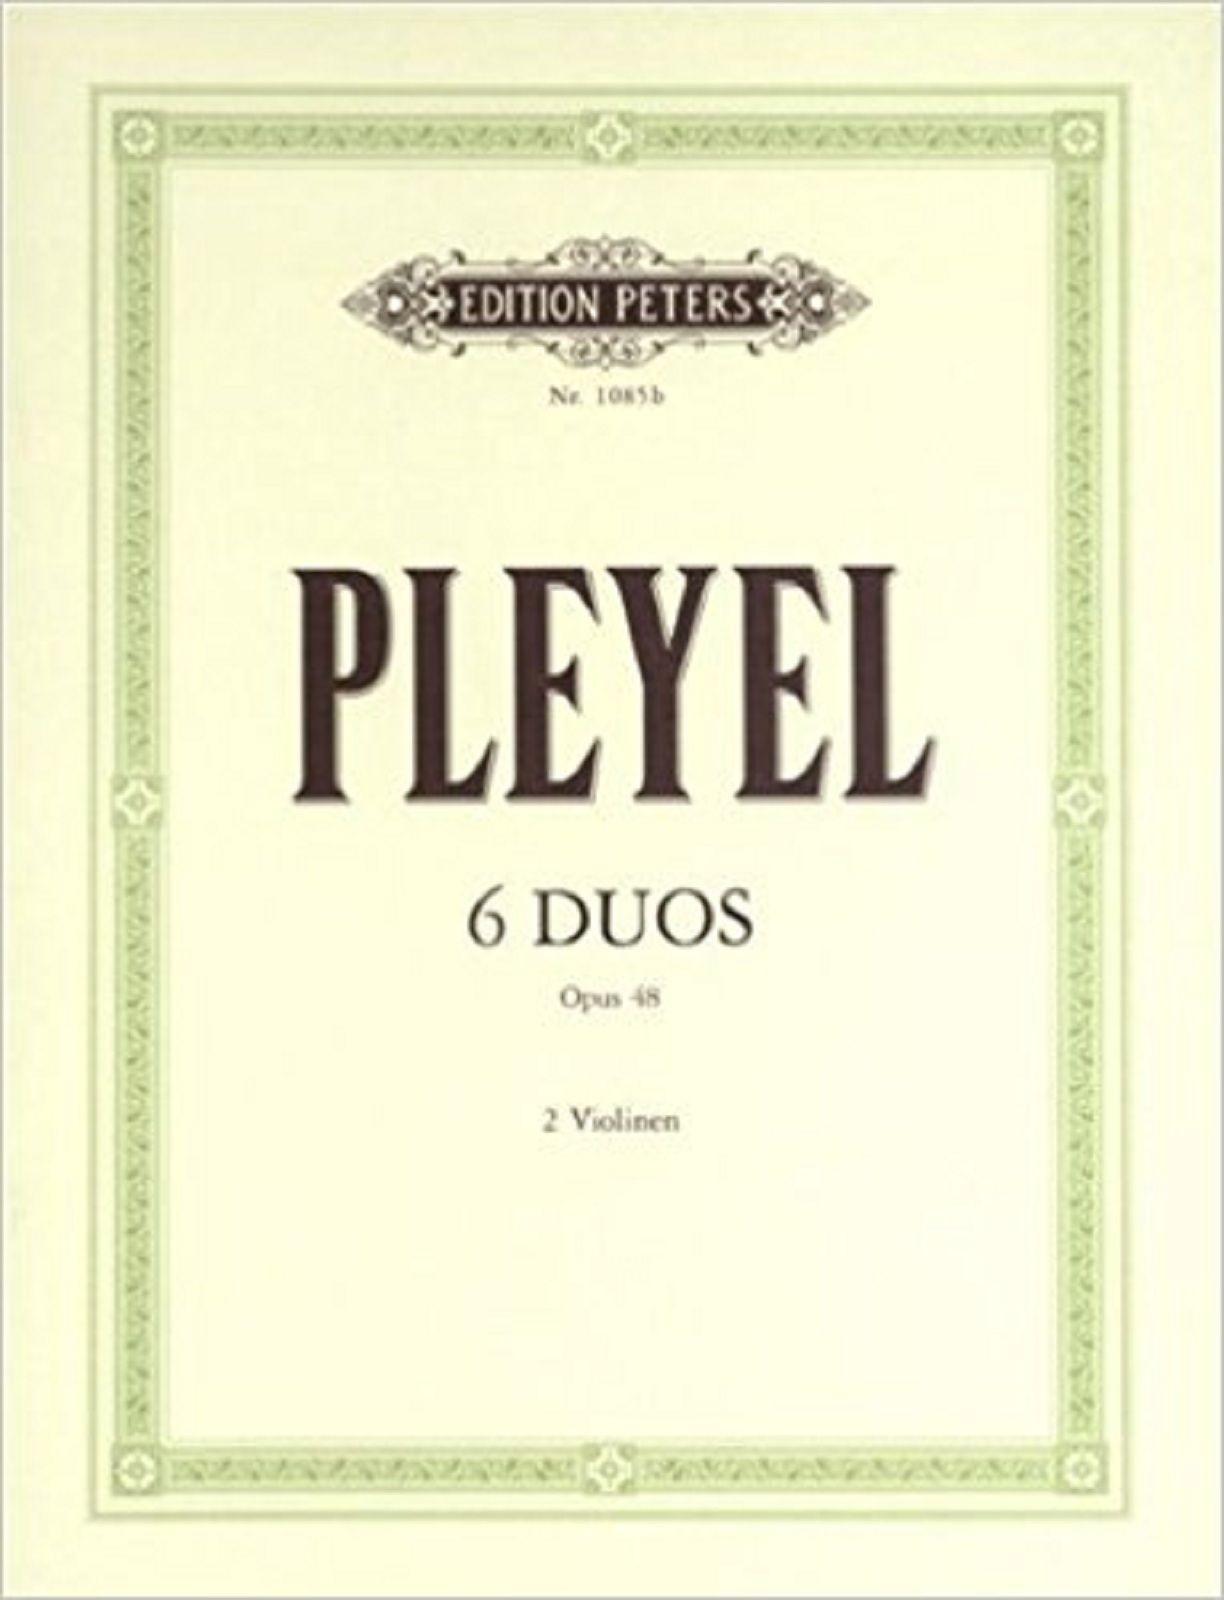 Pleyel 6 Duos Opus 48 2 Violin Sheet Music Duet Book S171